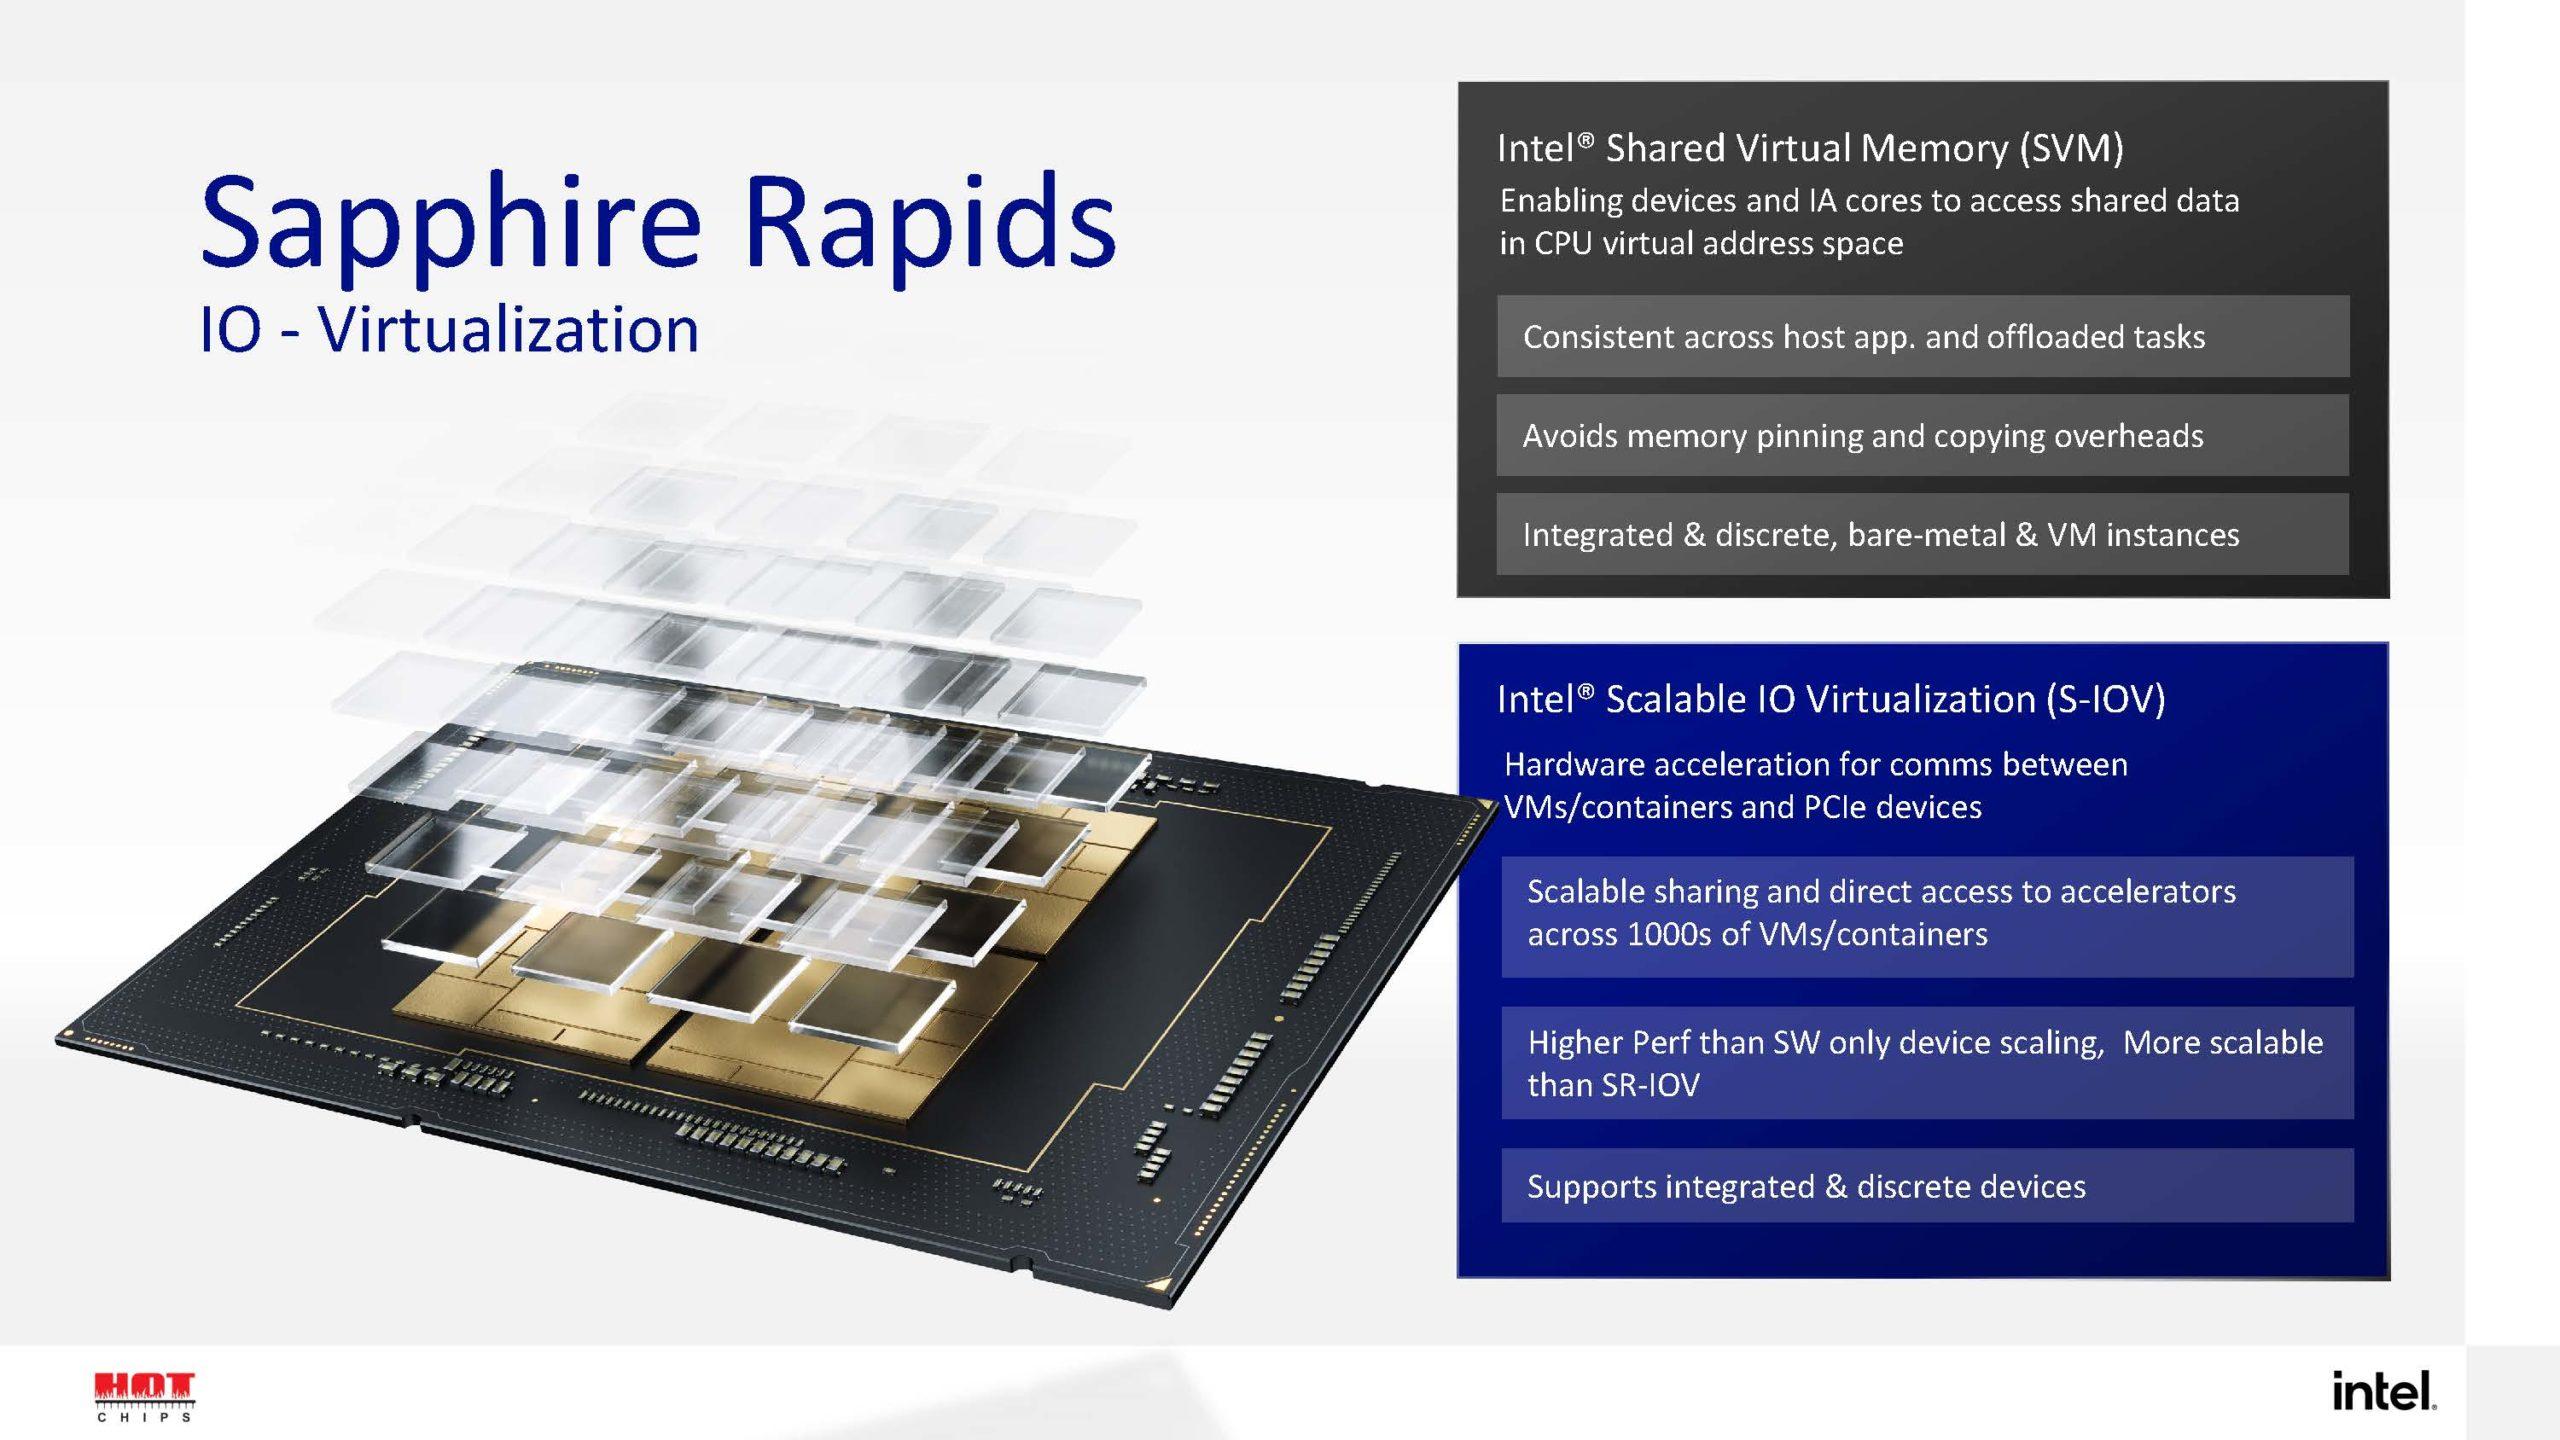 HC33 Intel Sapphire Rapids IO Virtualization